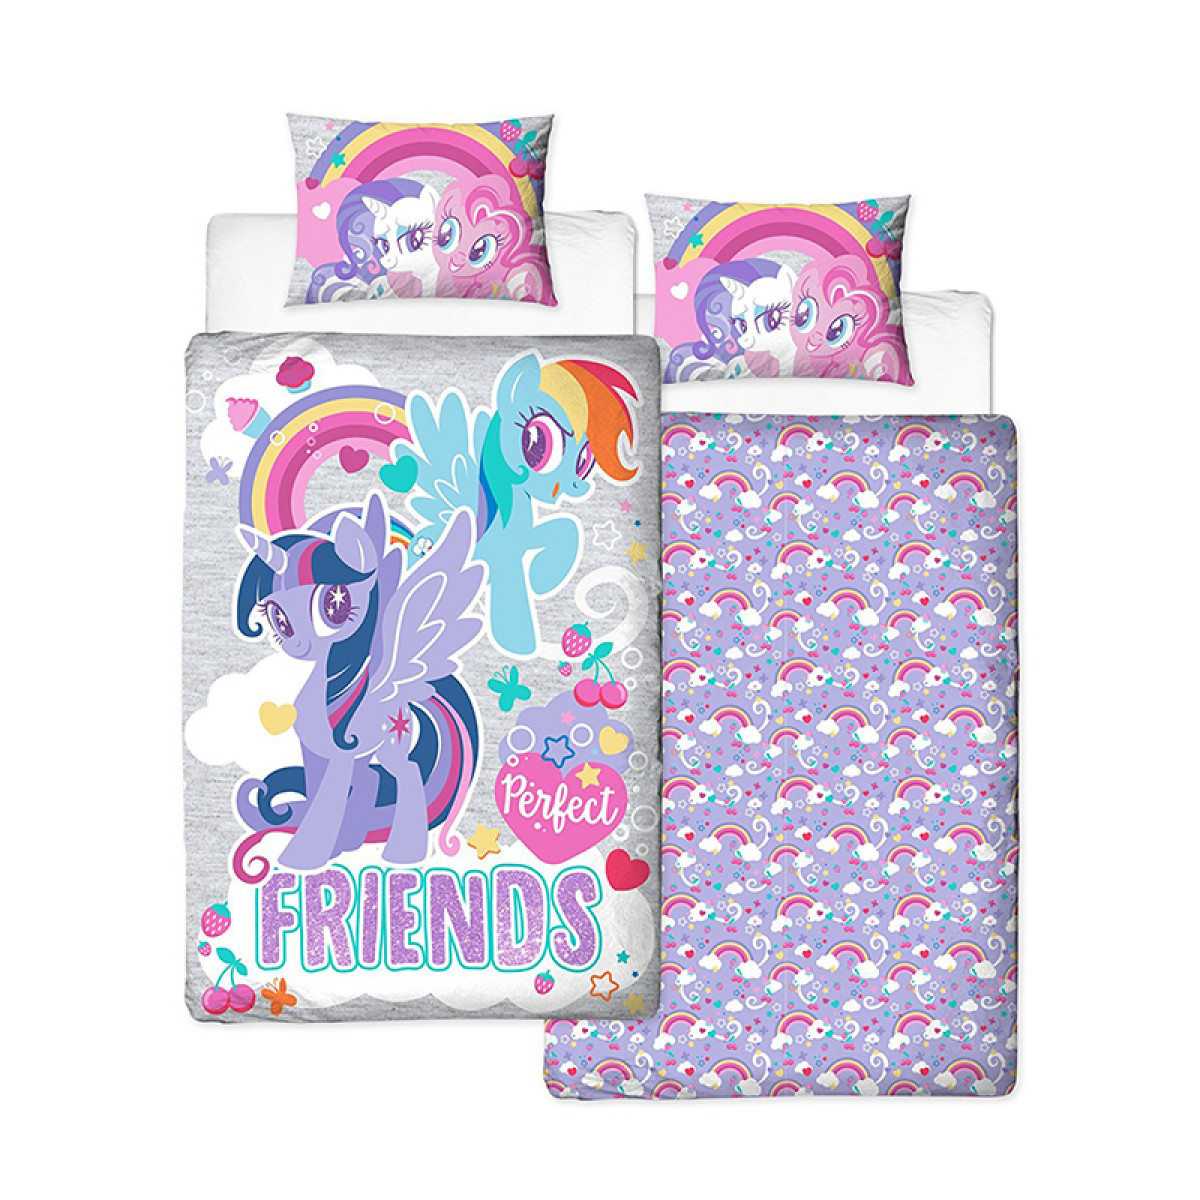 Copripiumino My Little Pony.My Little Pony Crush Single Duvet Cover Set Panel Design Bedroom